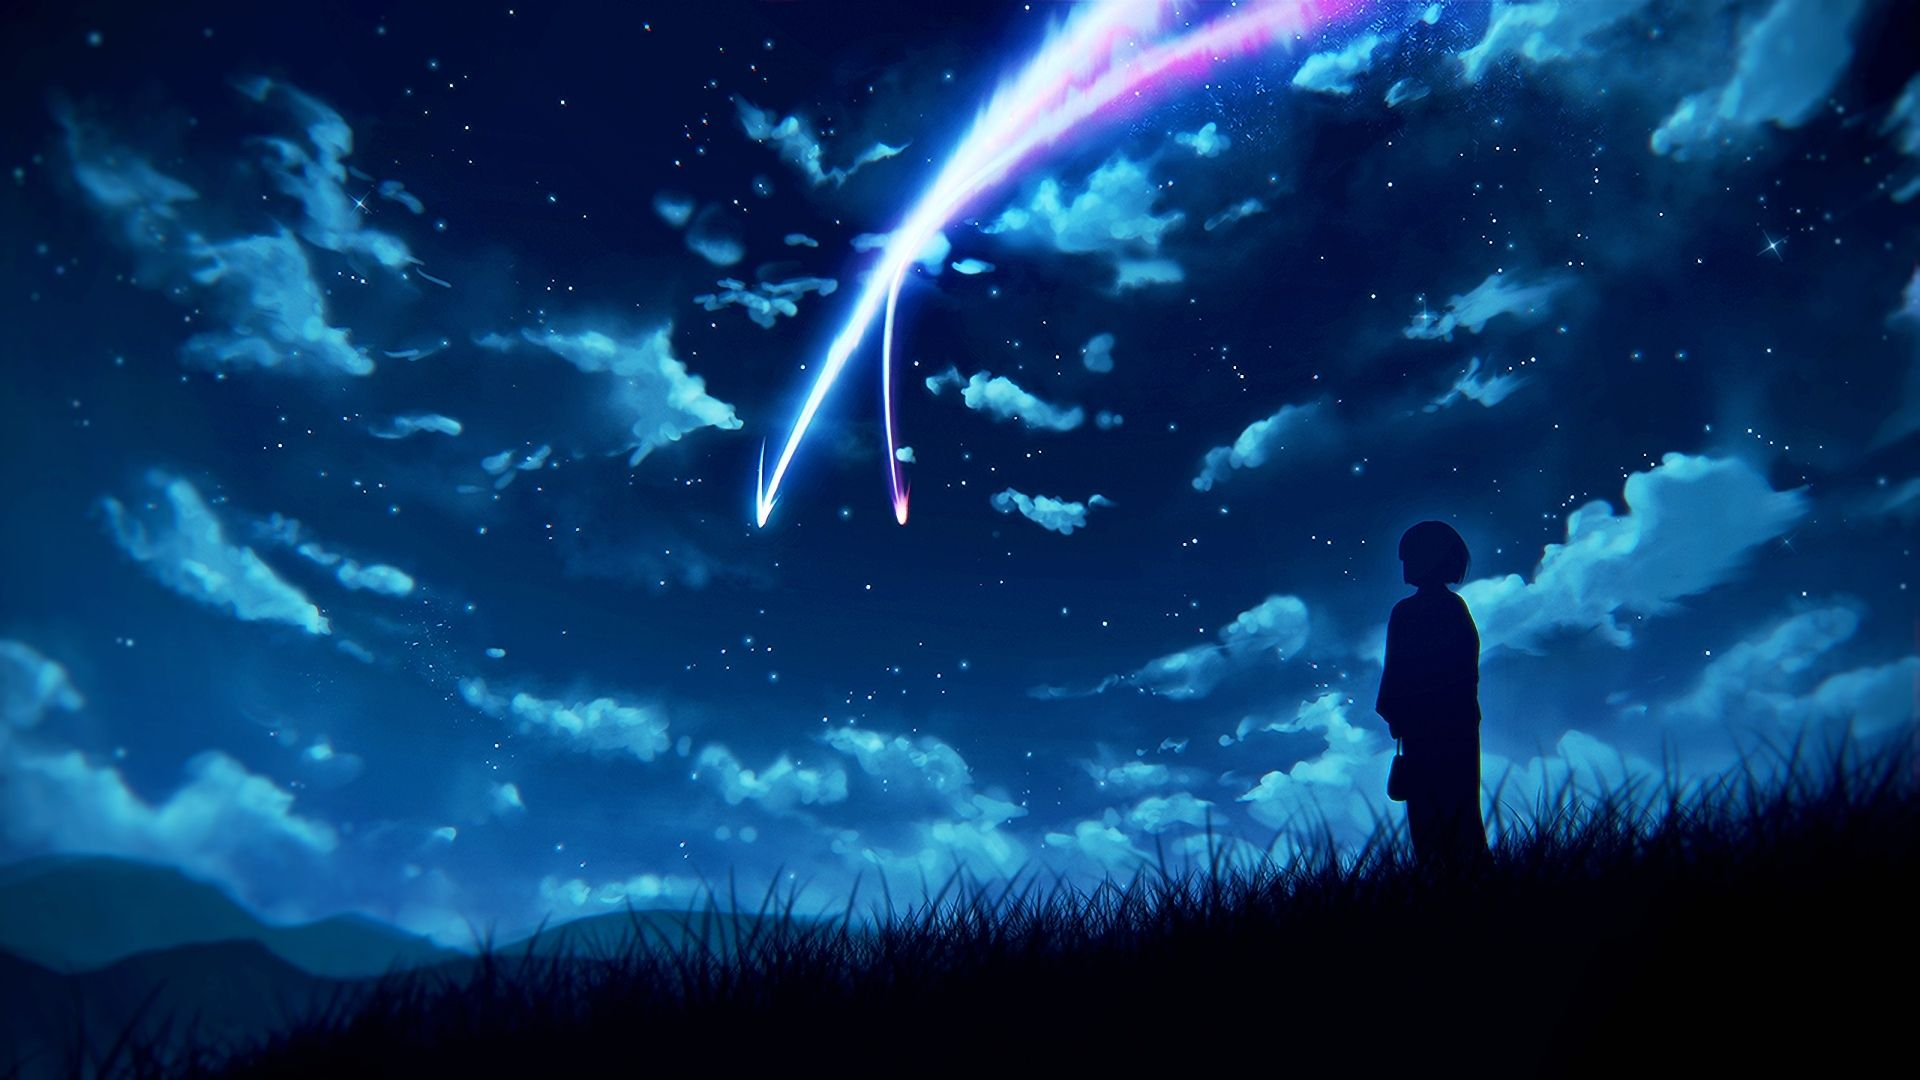 Anime Your Name Mitsuha Miyamizu Kimi No Na Wa Wallpaper Kimi No Na Wa Wallpaper Scenery Wallpaper Anime Scenery